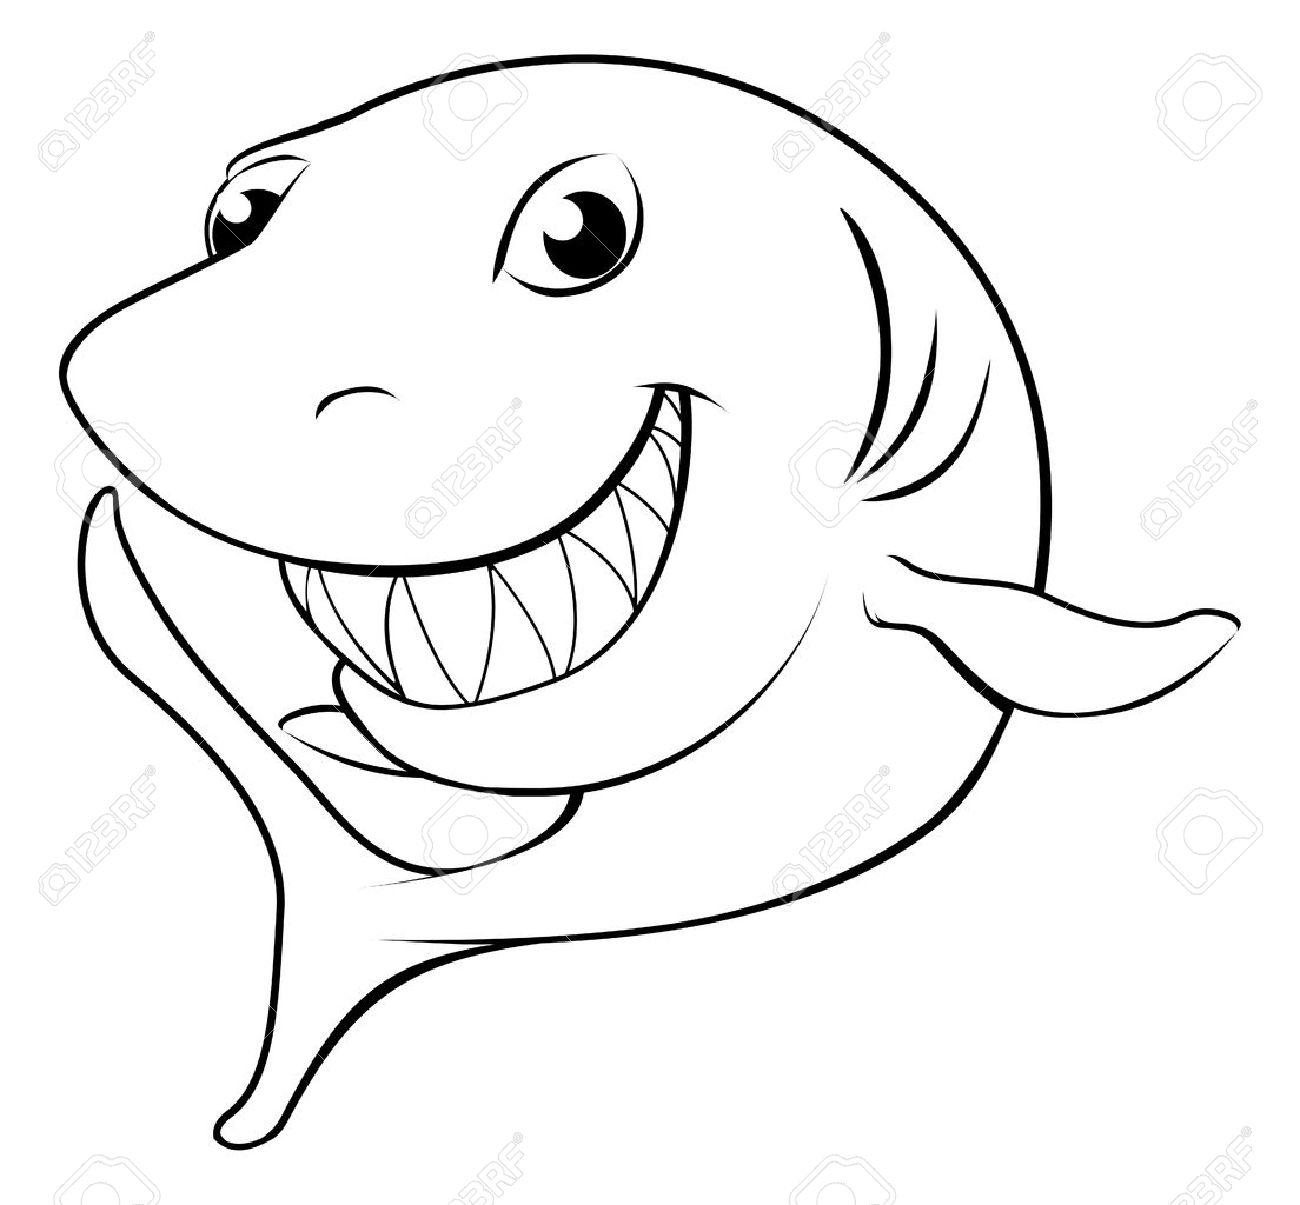 1300x1205 Black And White Illustration Of A Happy Cartoon Shark Royalty Free